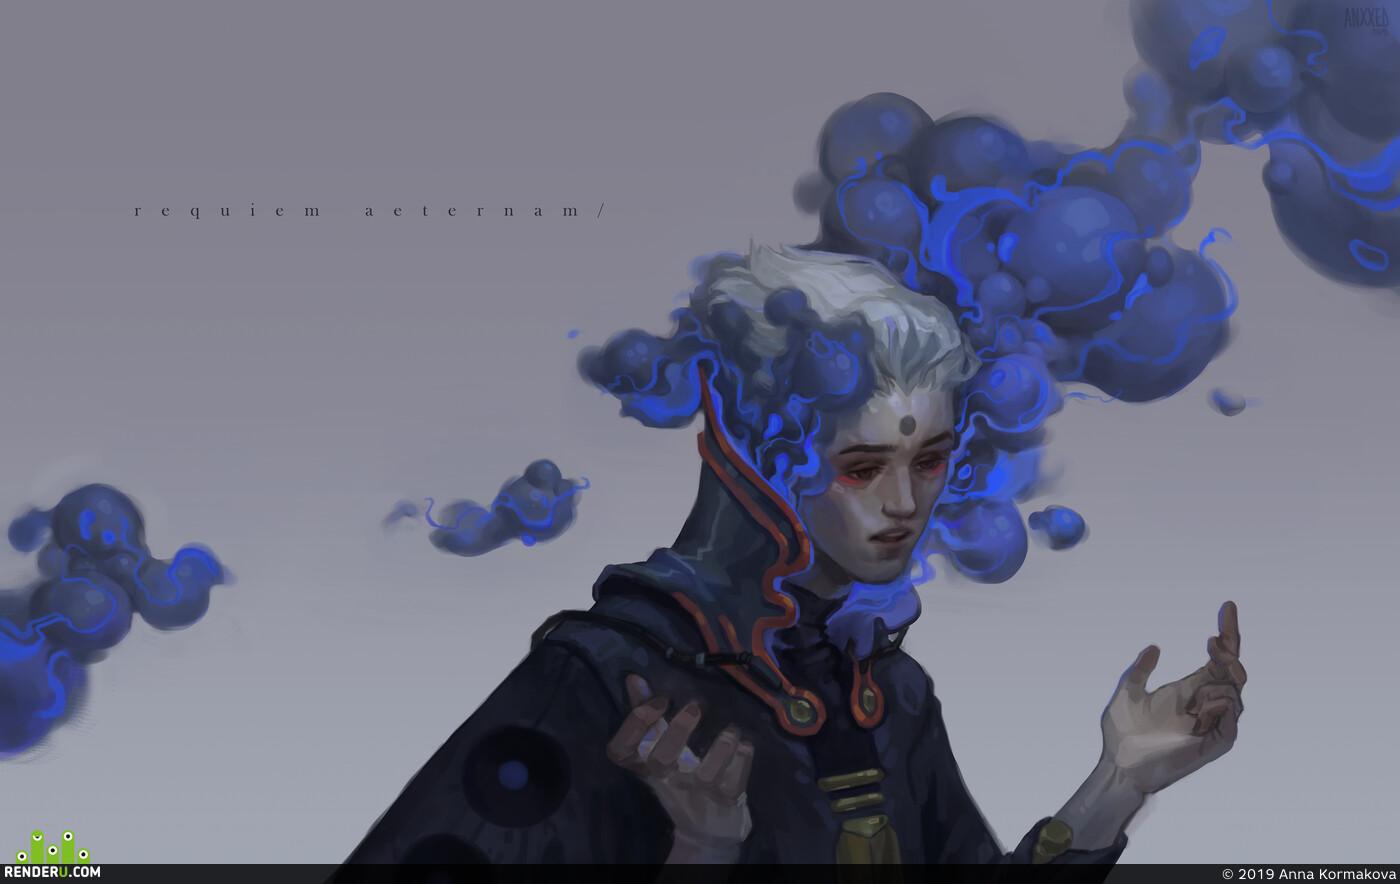 2D, Digital 2D, иллюстрация, Персонажи, Концепт-арт, scifi, sci-fi